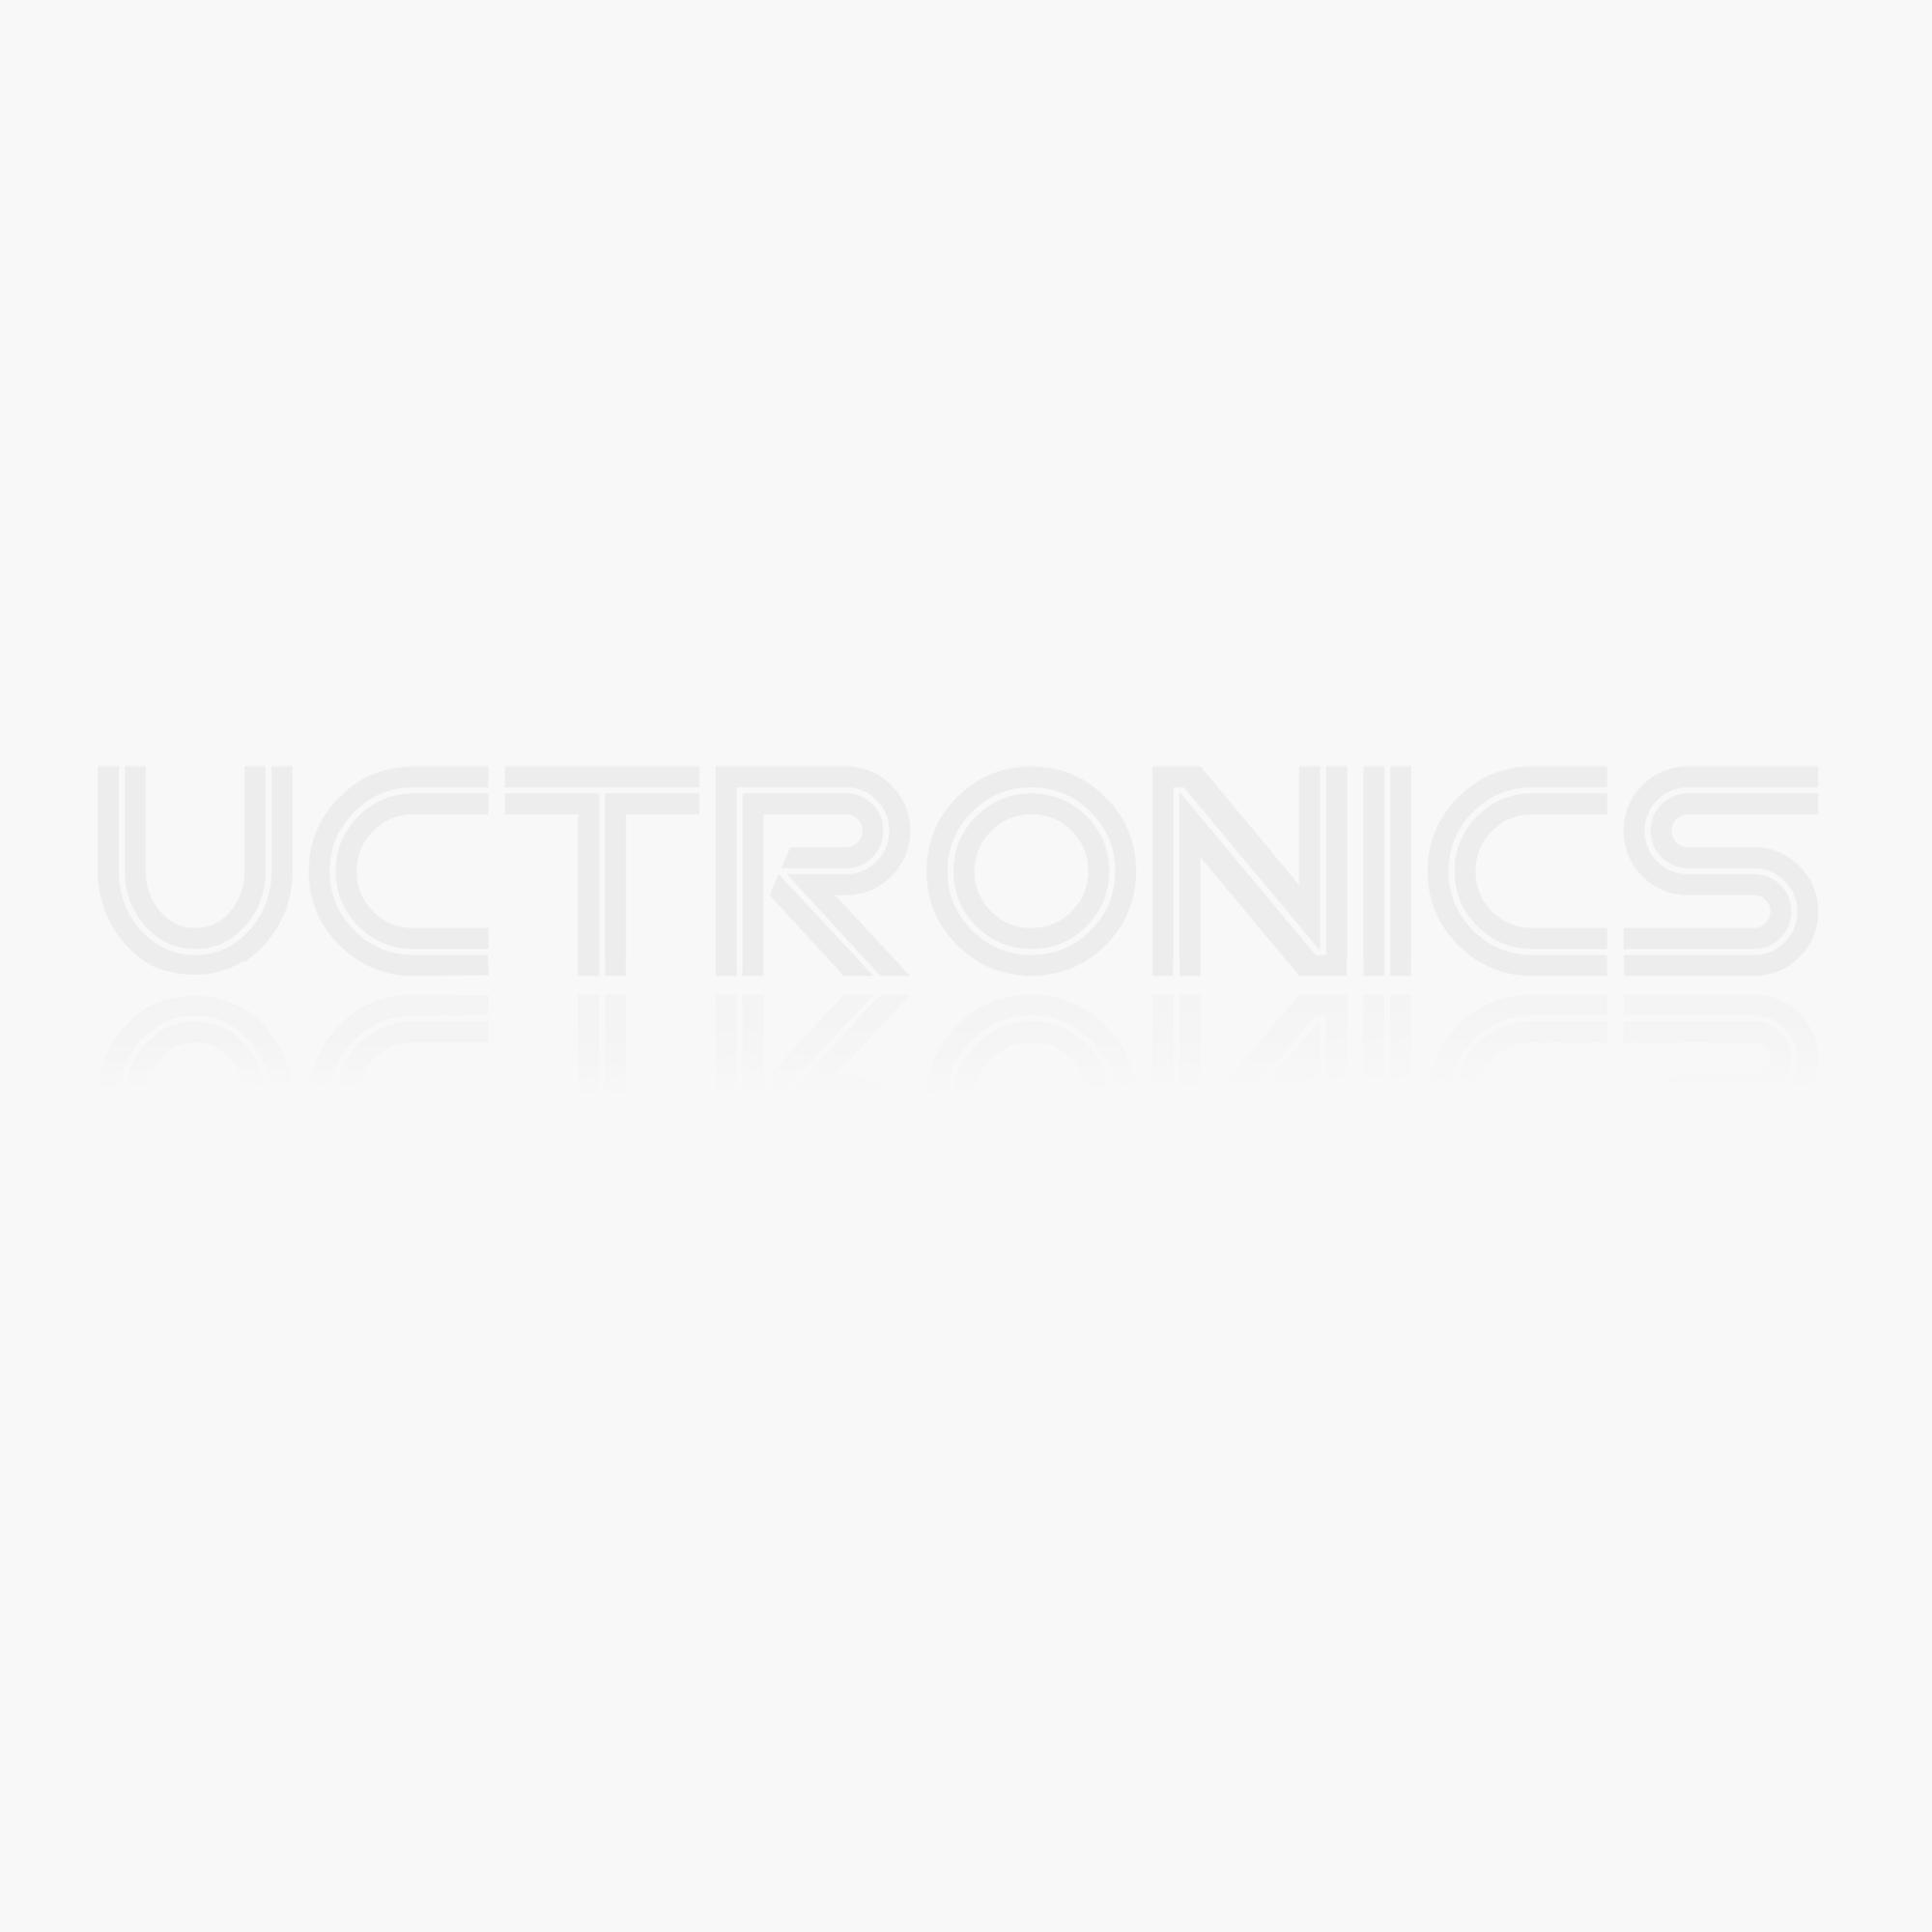 12V 24V 36V 3A PWM DC Motor Unidirectional Speed Control /w Potentiometer Switch